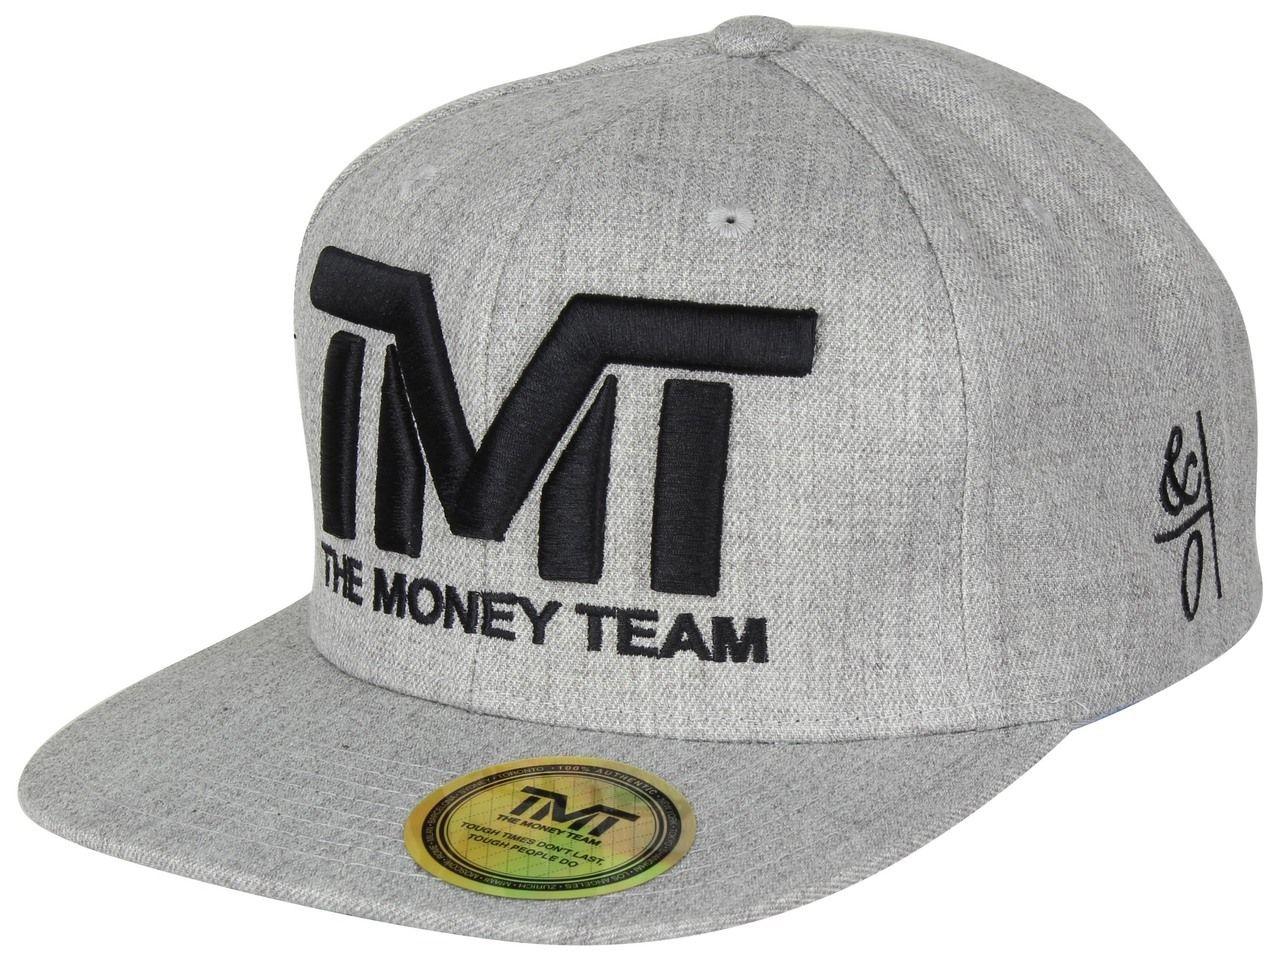 d86e916b The Money Team TMT Floyd Mayweather Courtside Snapback Hat (Heather Gray/ Black). March 2019